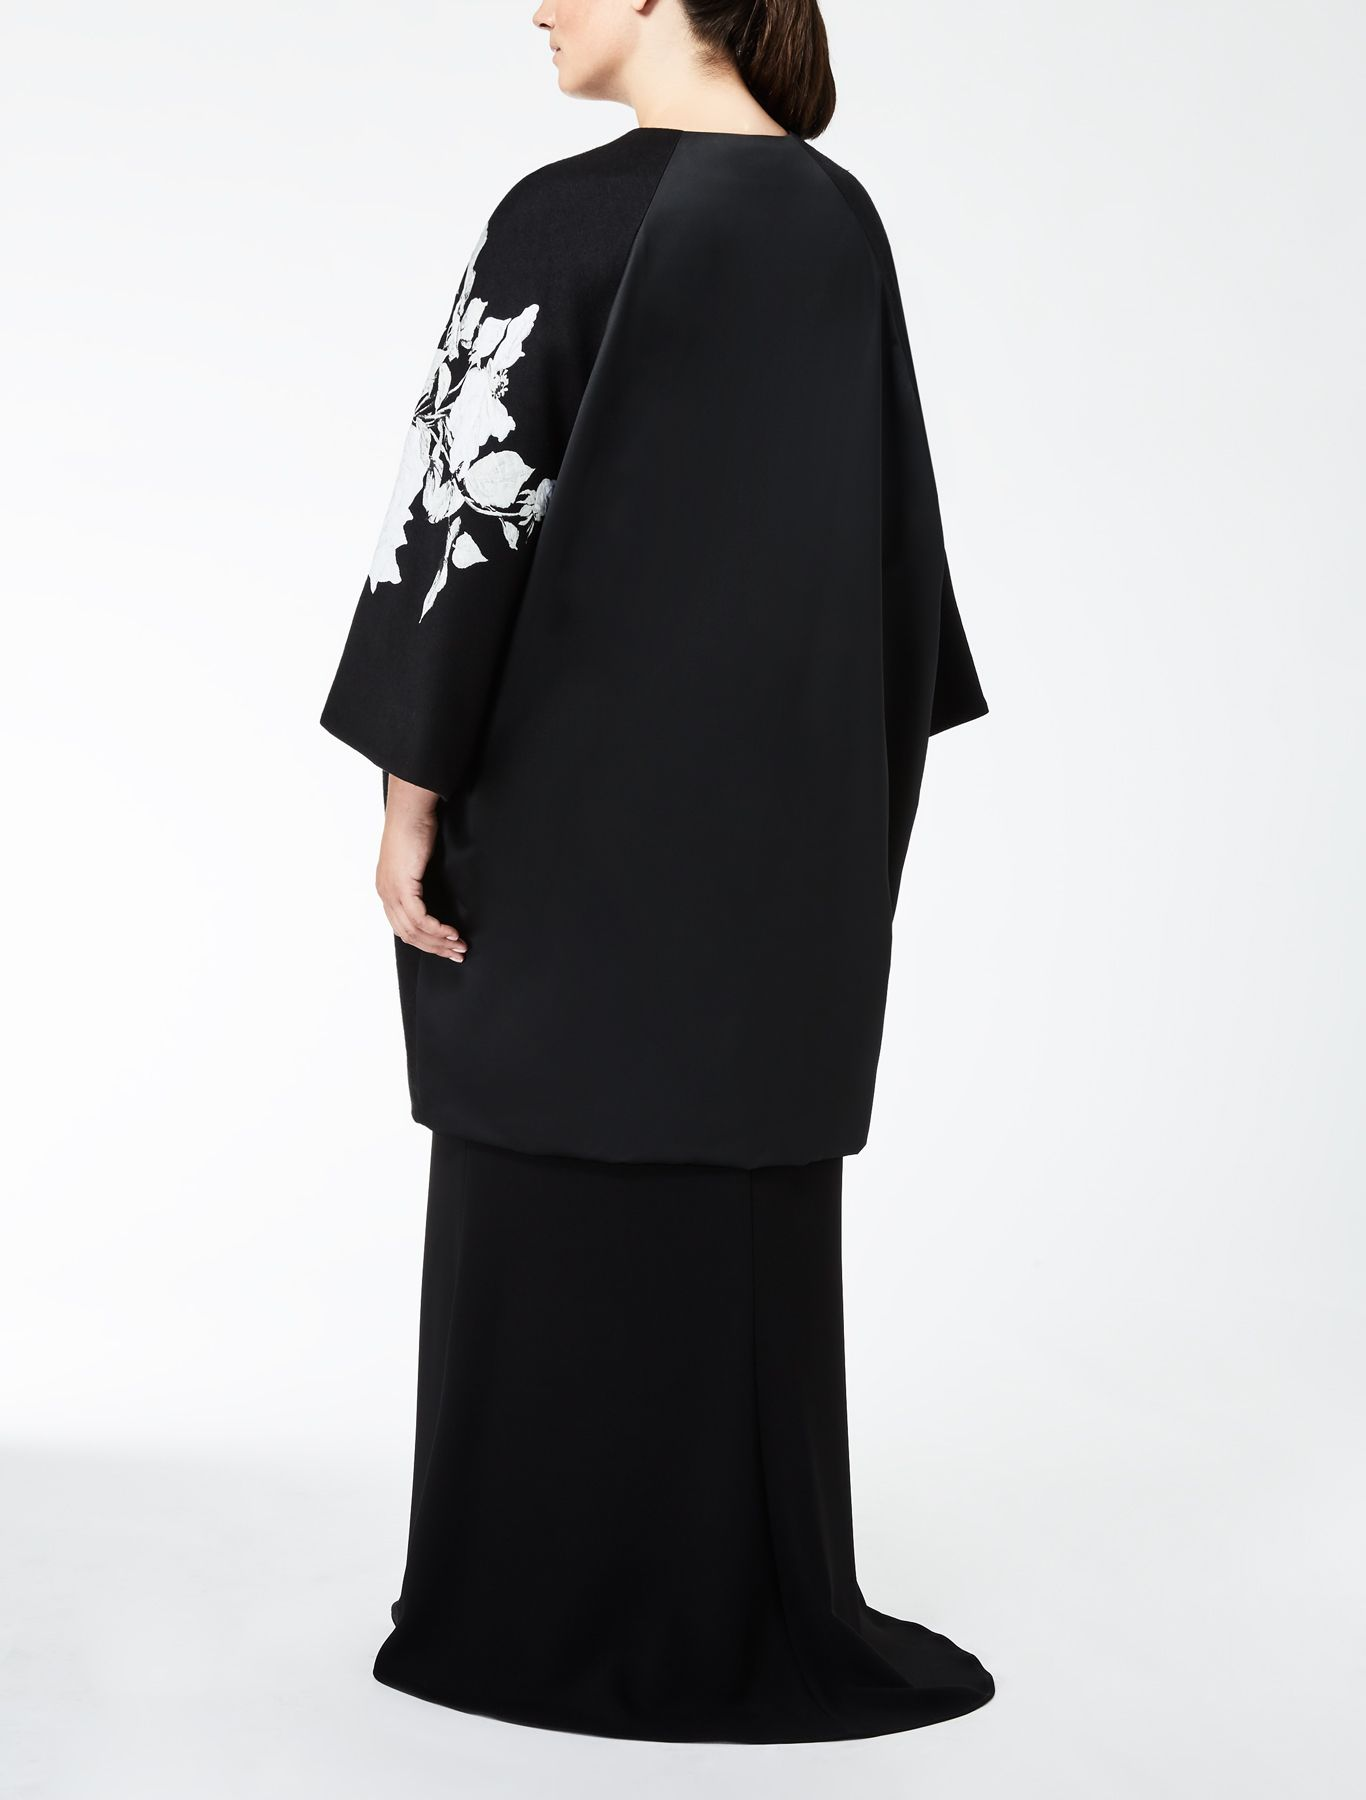 Marina Rinaldi NAZIONE nero: Giaccone jacquard disegno rose.